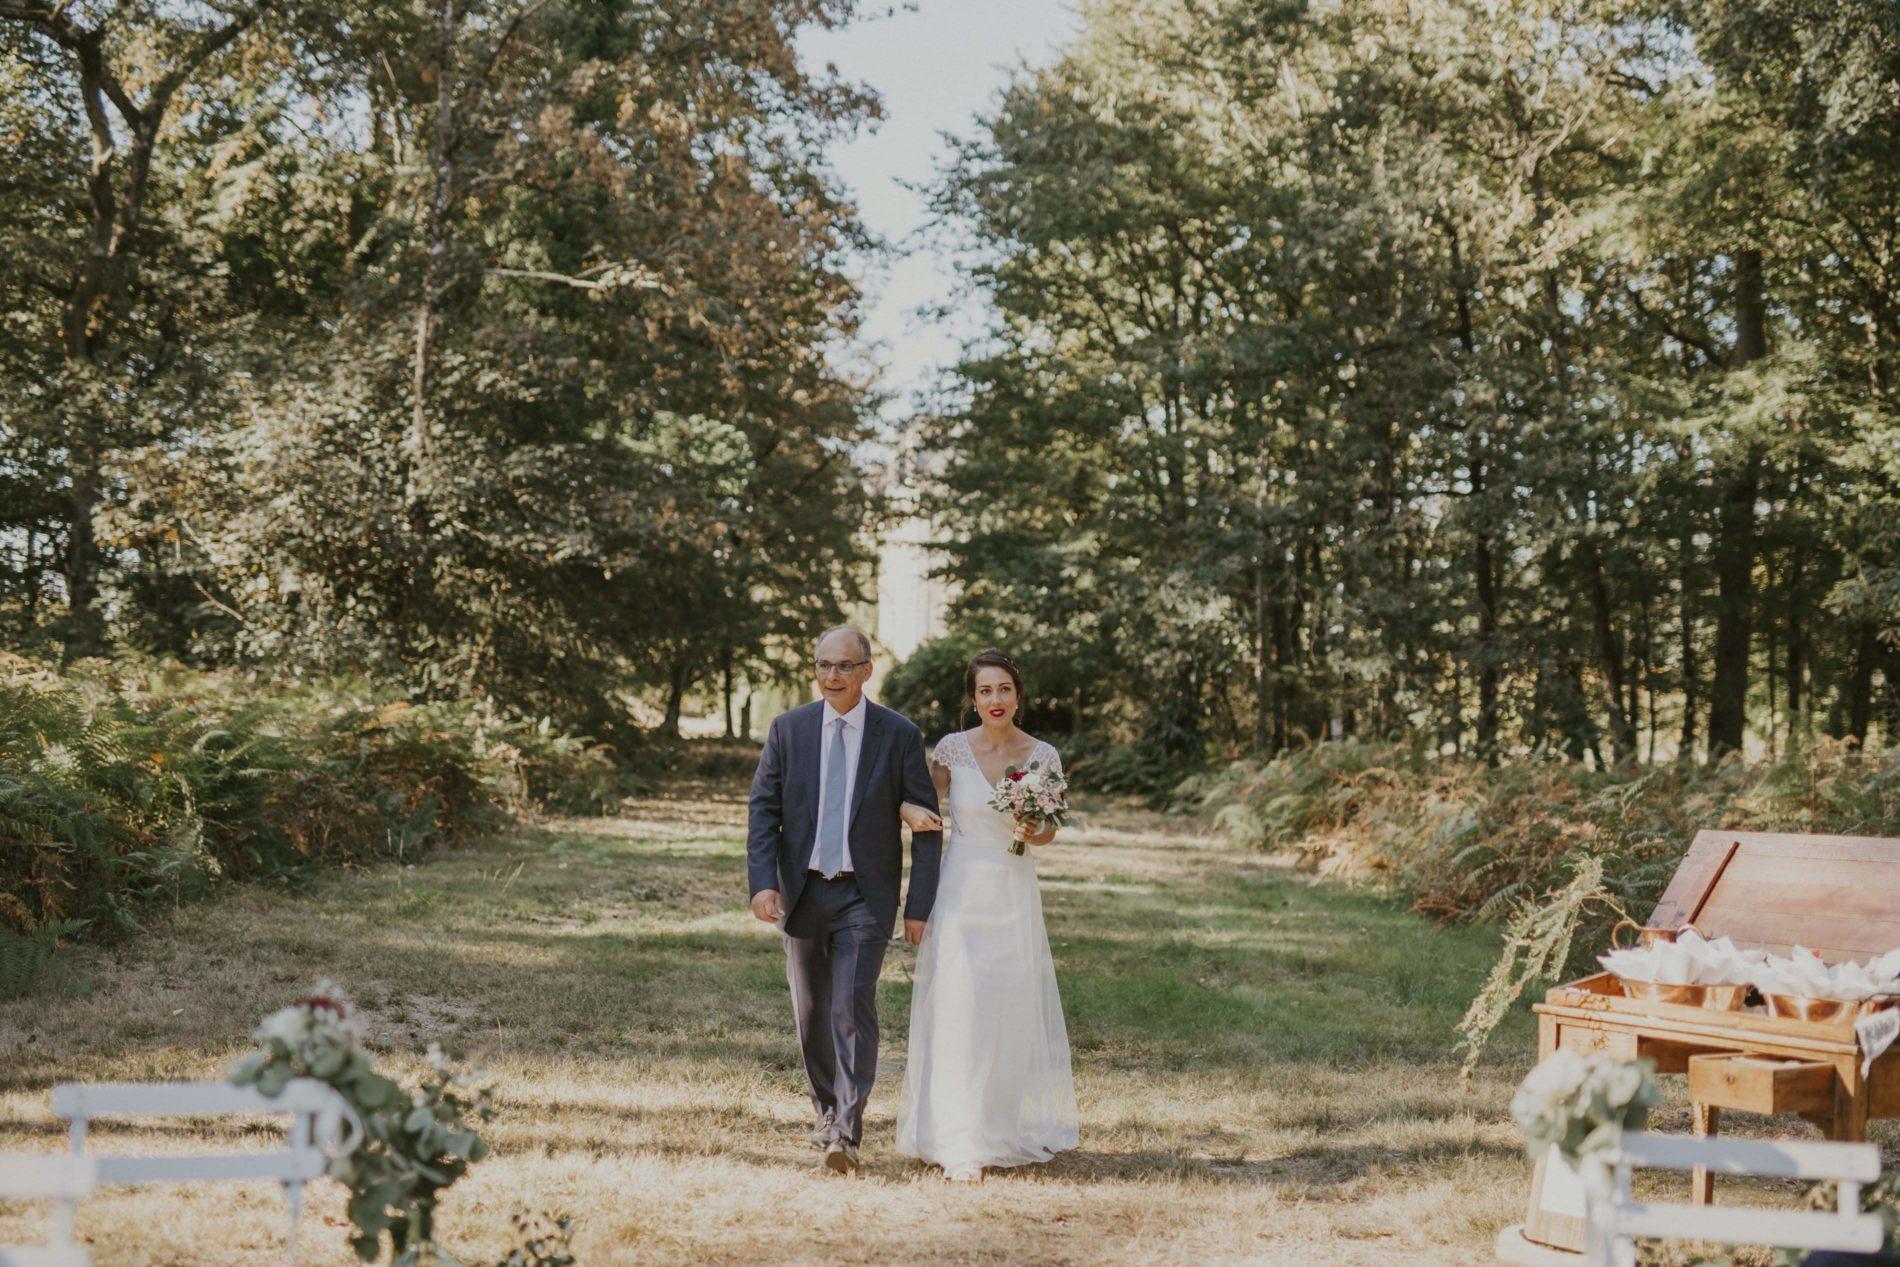 0137_03-CelineSereivuth-137-obonheurdesdames-decoration-mariage-location-Jordane-Chaillou